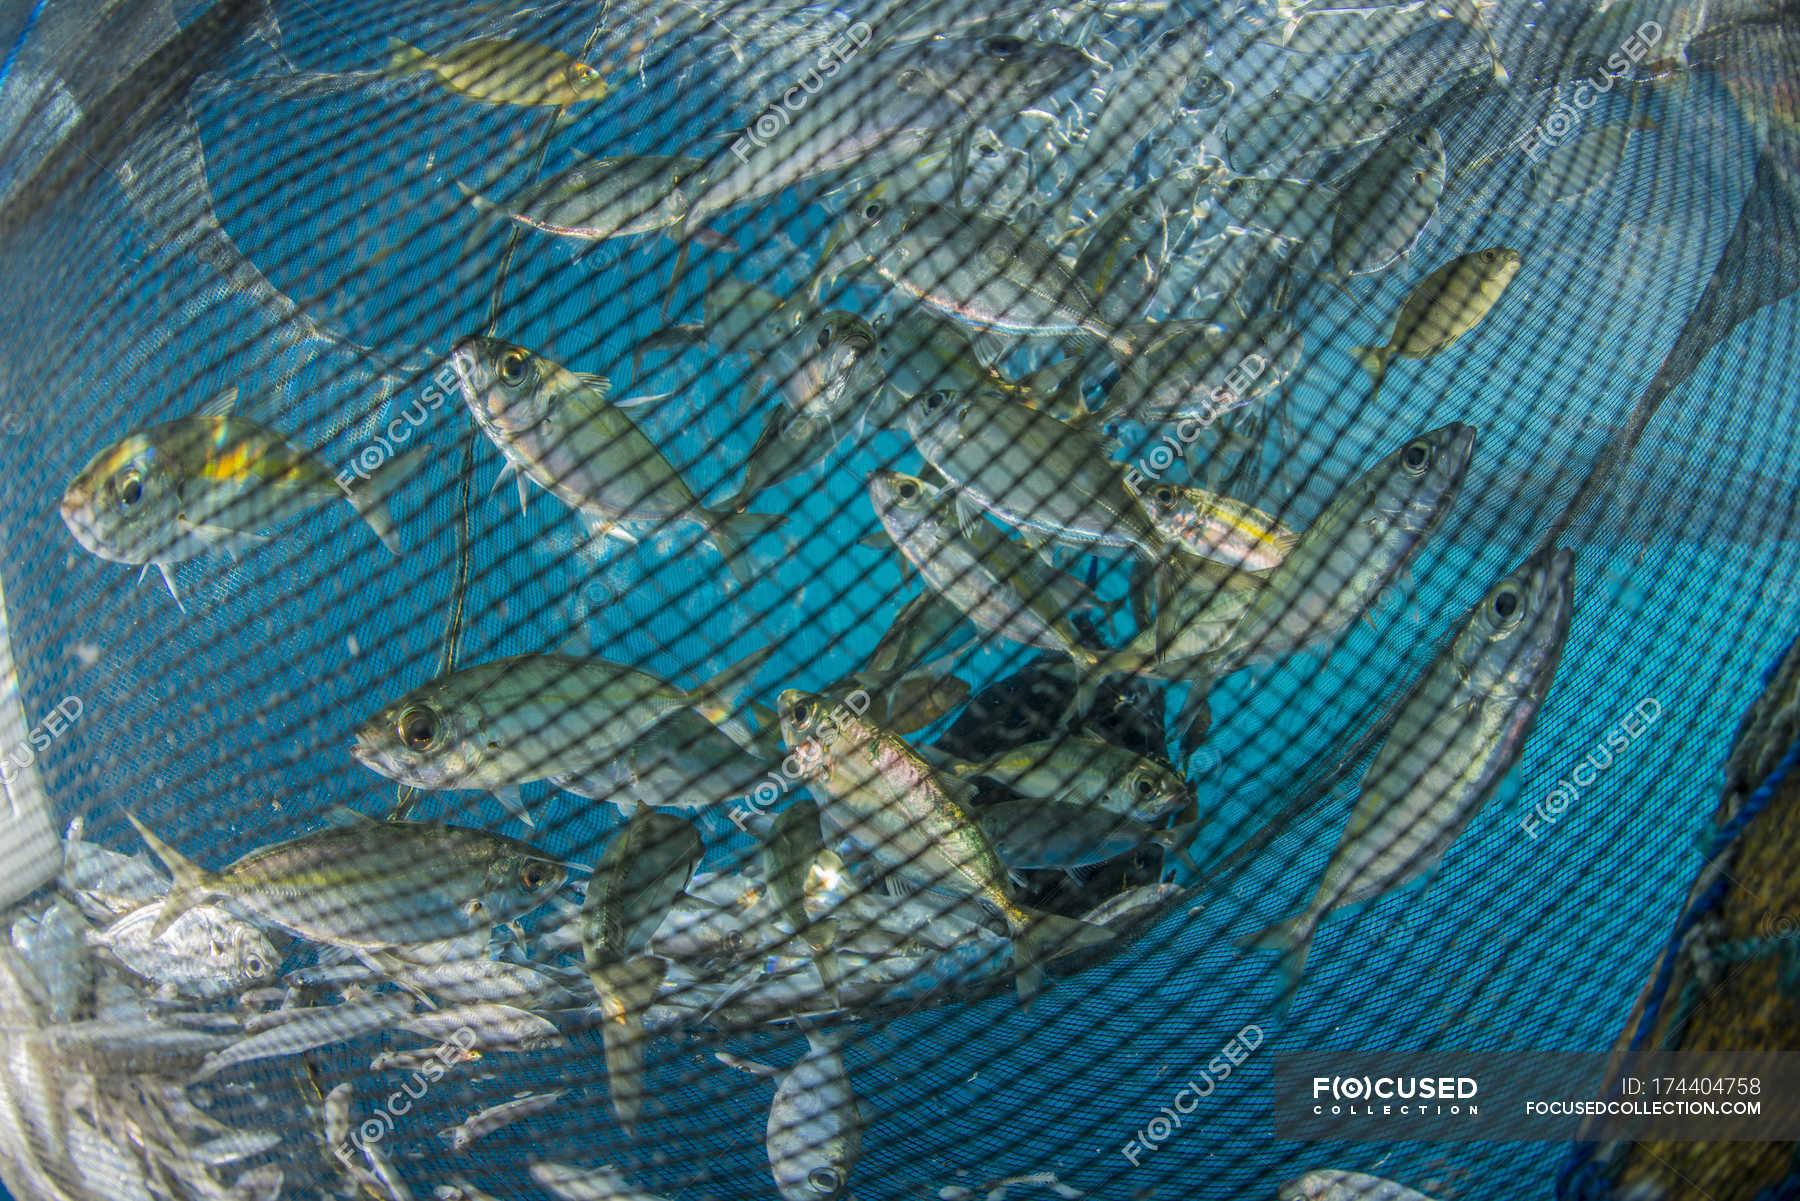 Asia Oceanic-Euipment Used For Fishing,Fishing Net,Fishing